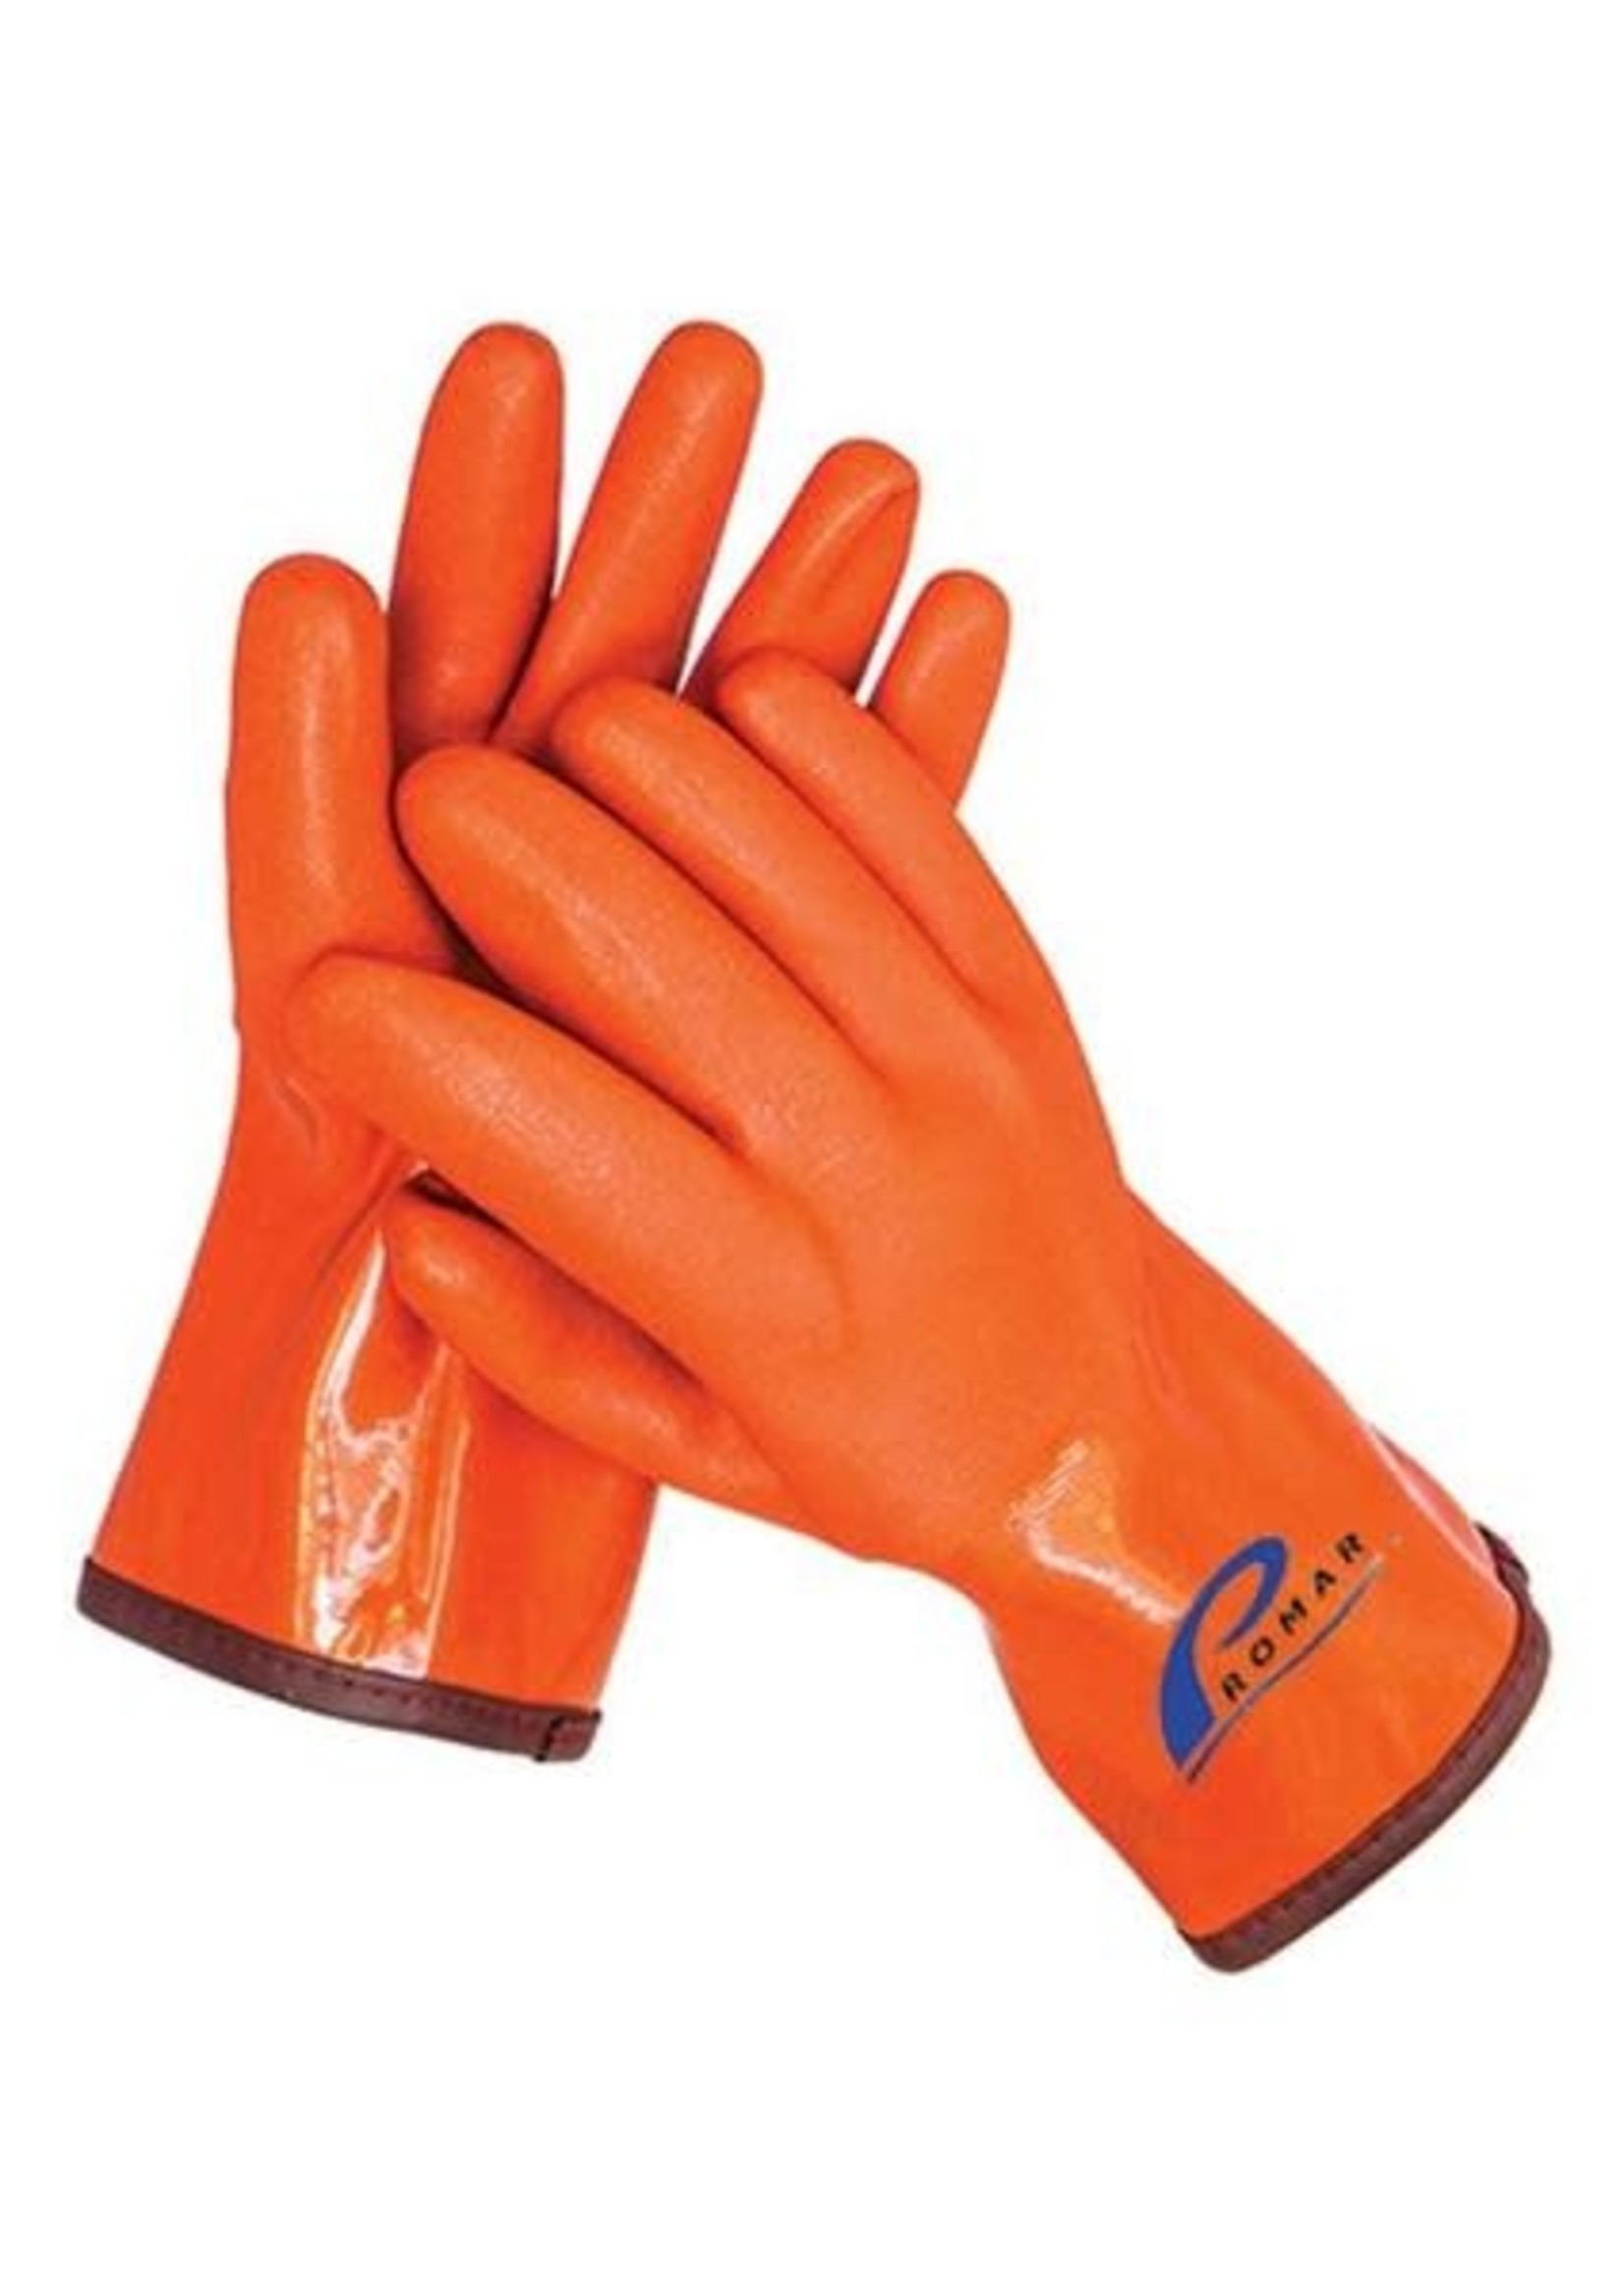 Promar Insulated ProGrip Gloves - Orange Large